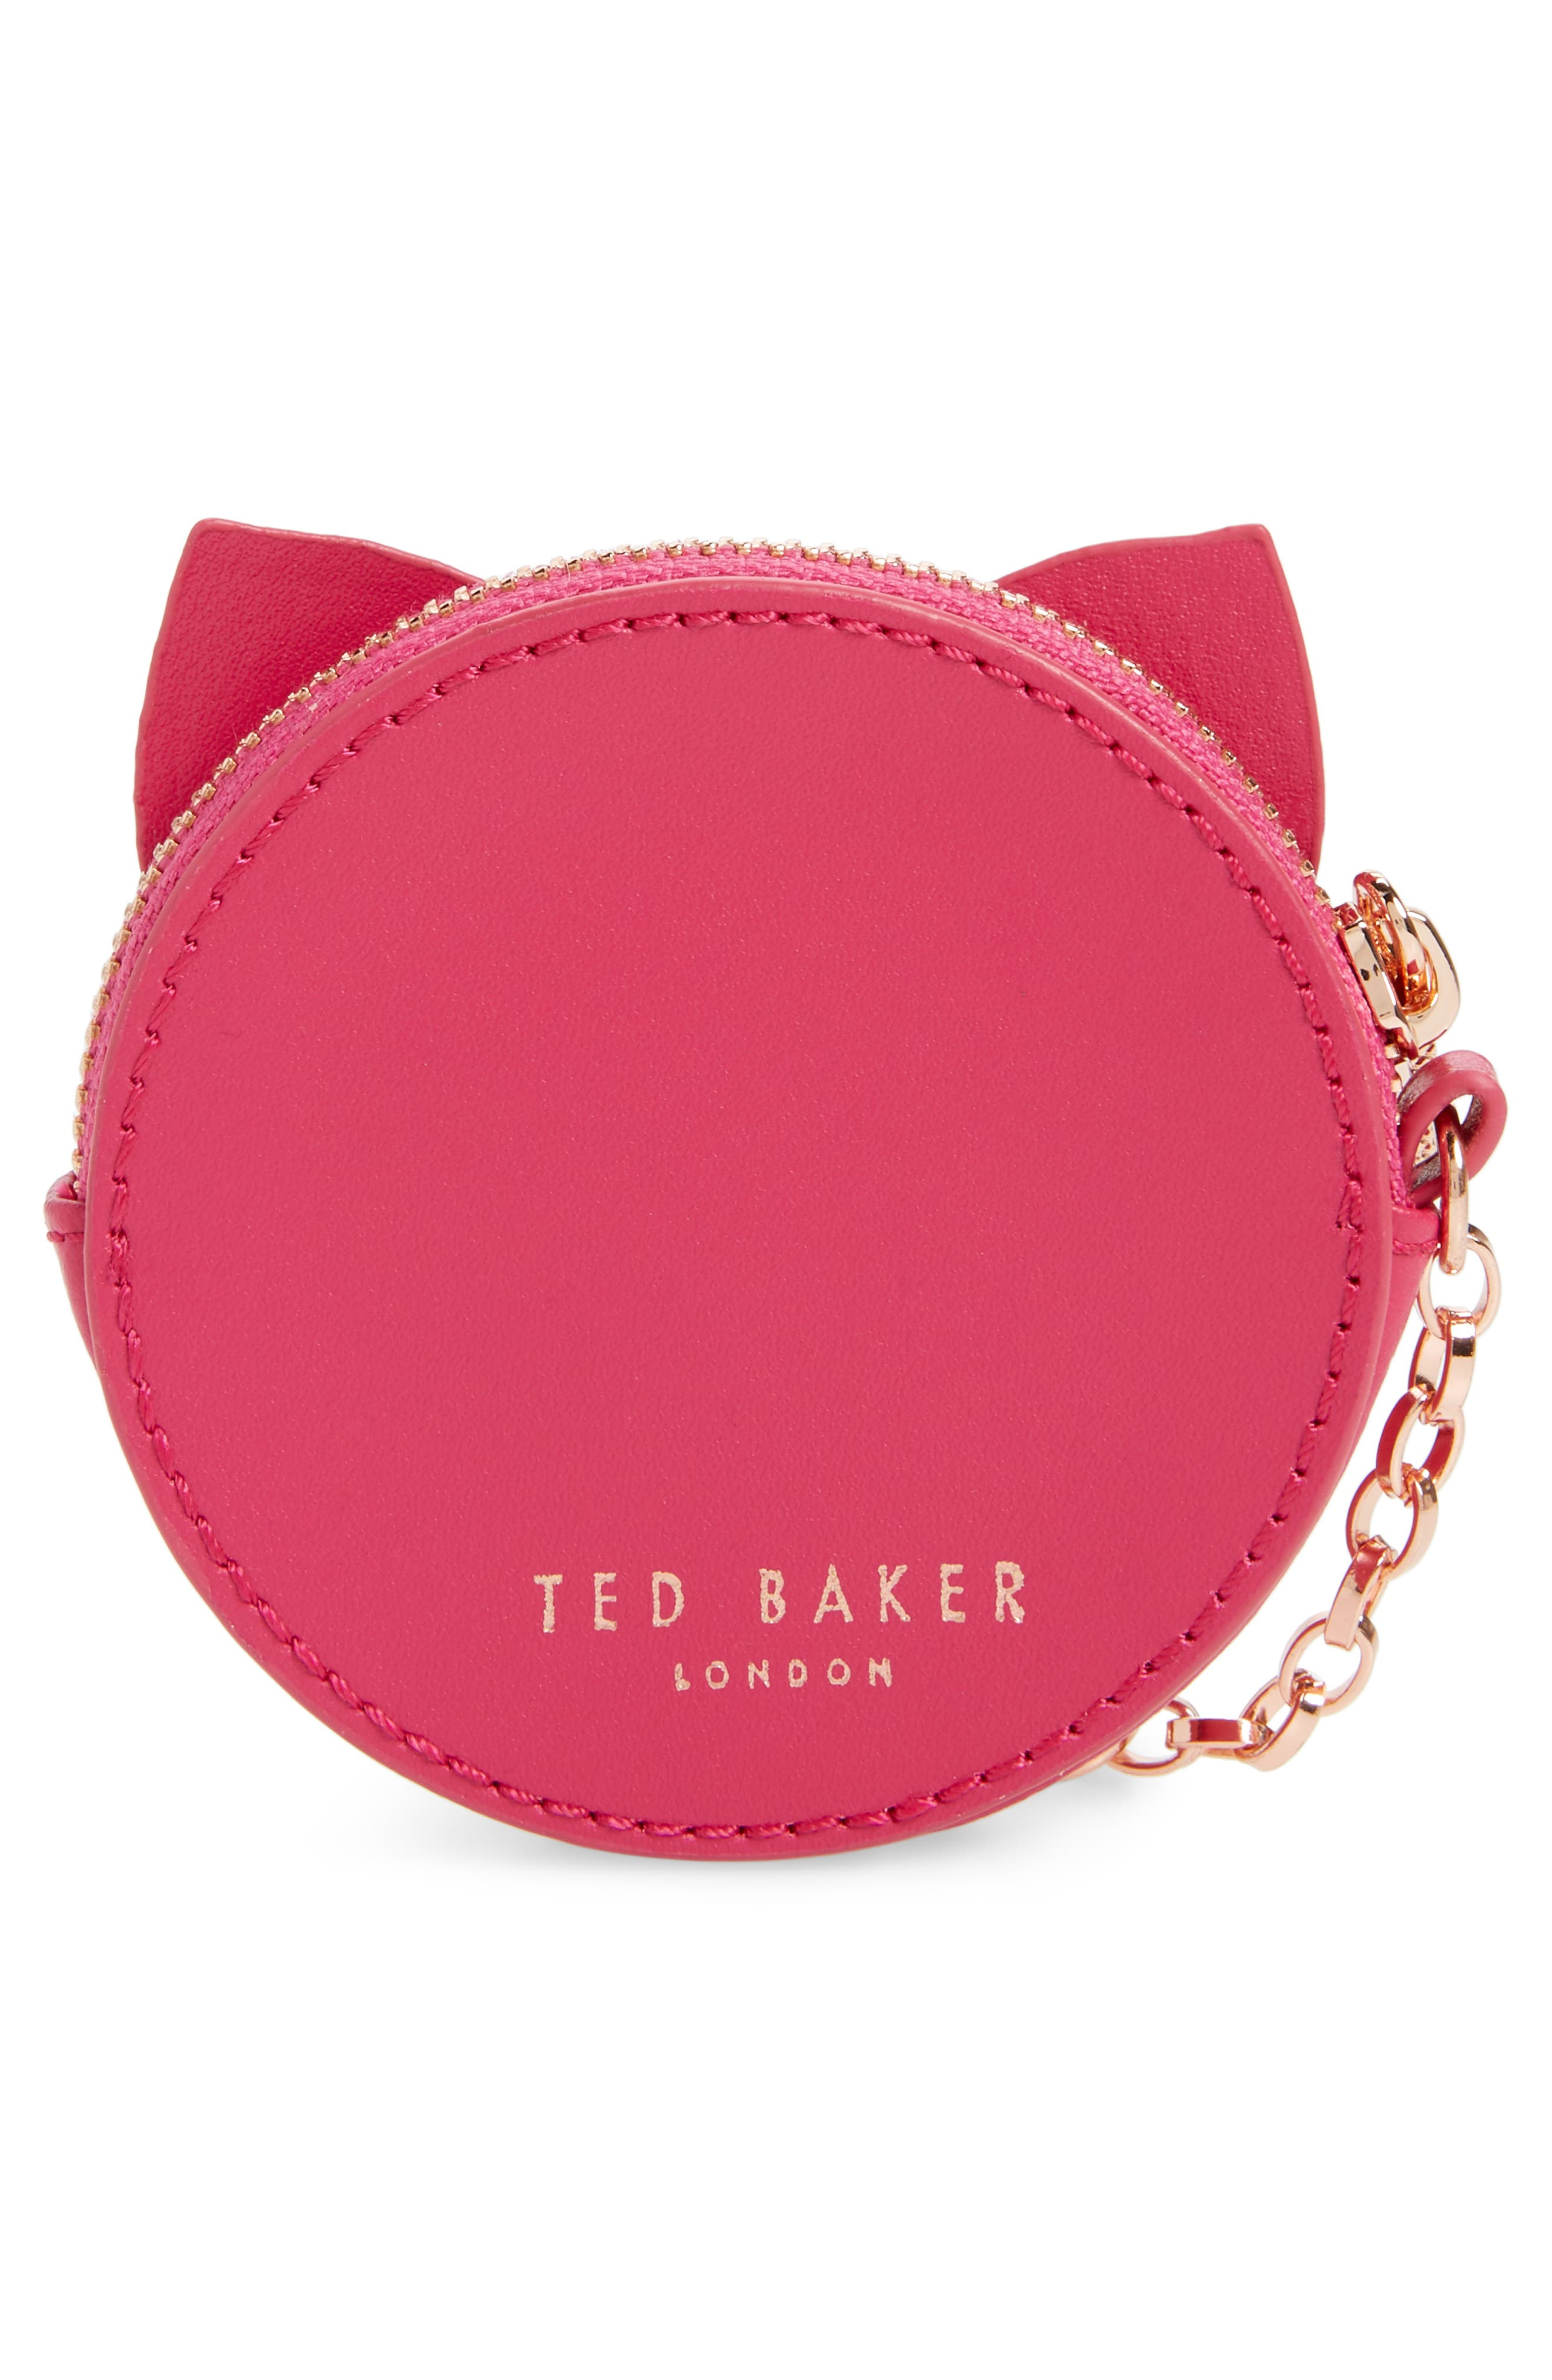 TED BAKER LONDON, Tabbiee Leather Coin Purse, Alternate thumbnail 4, color, FUCHSIA